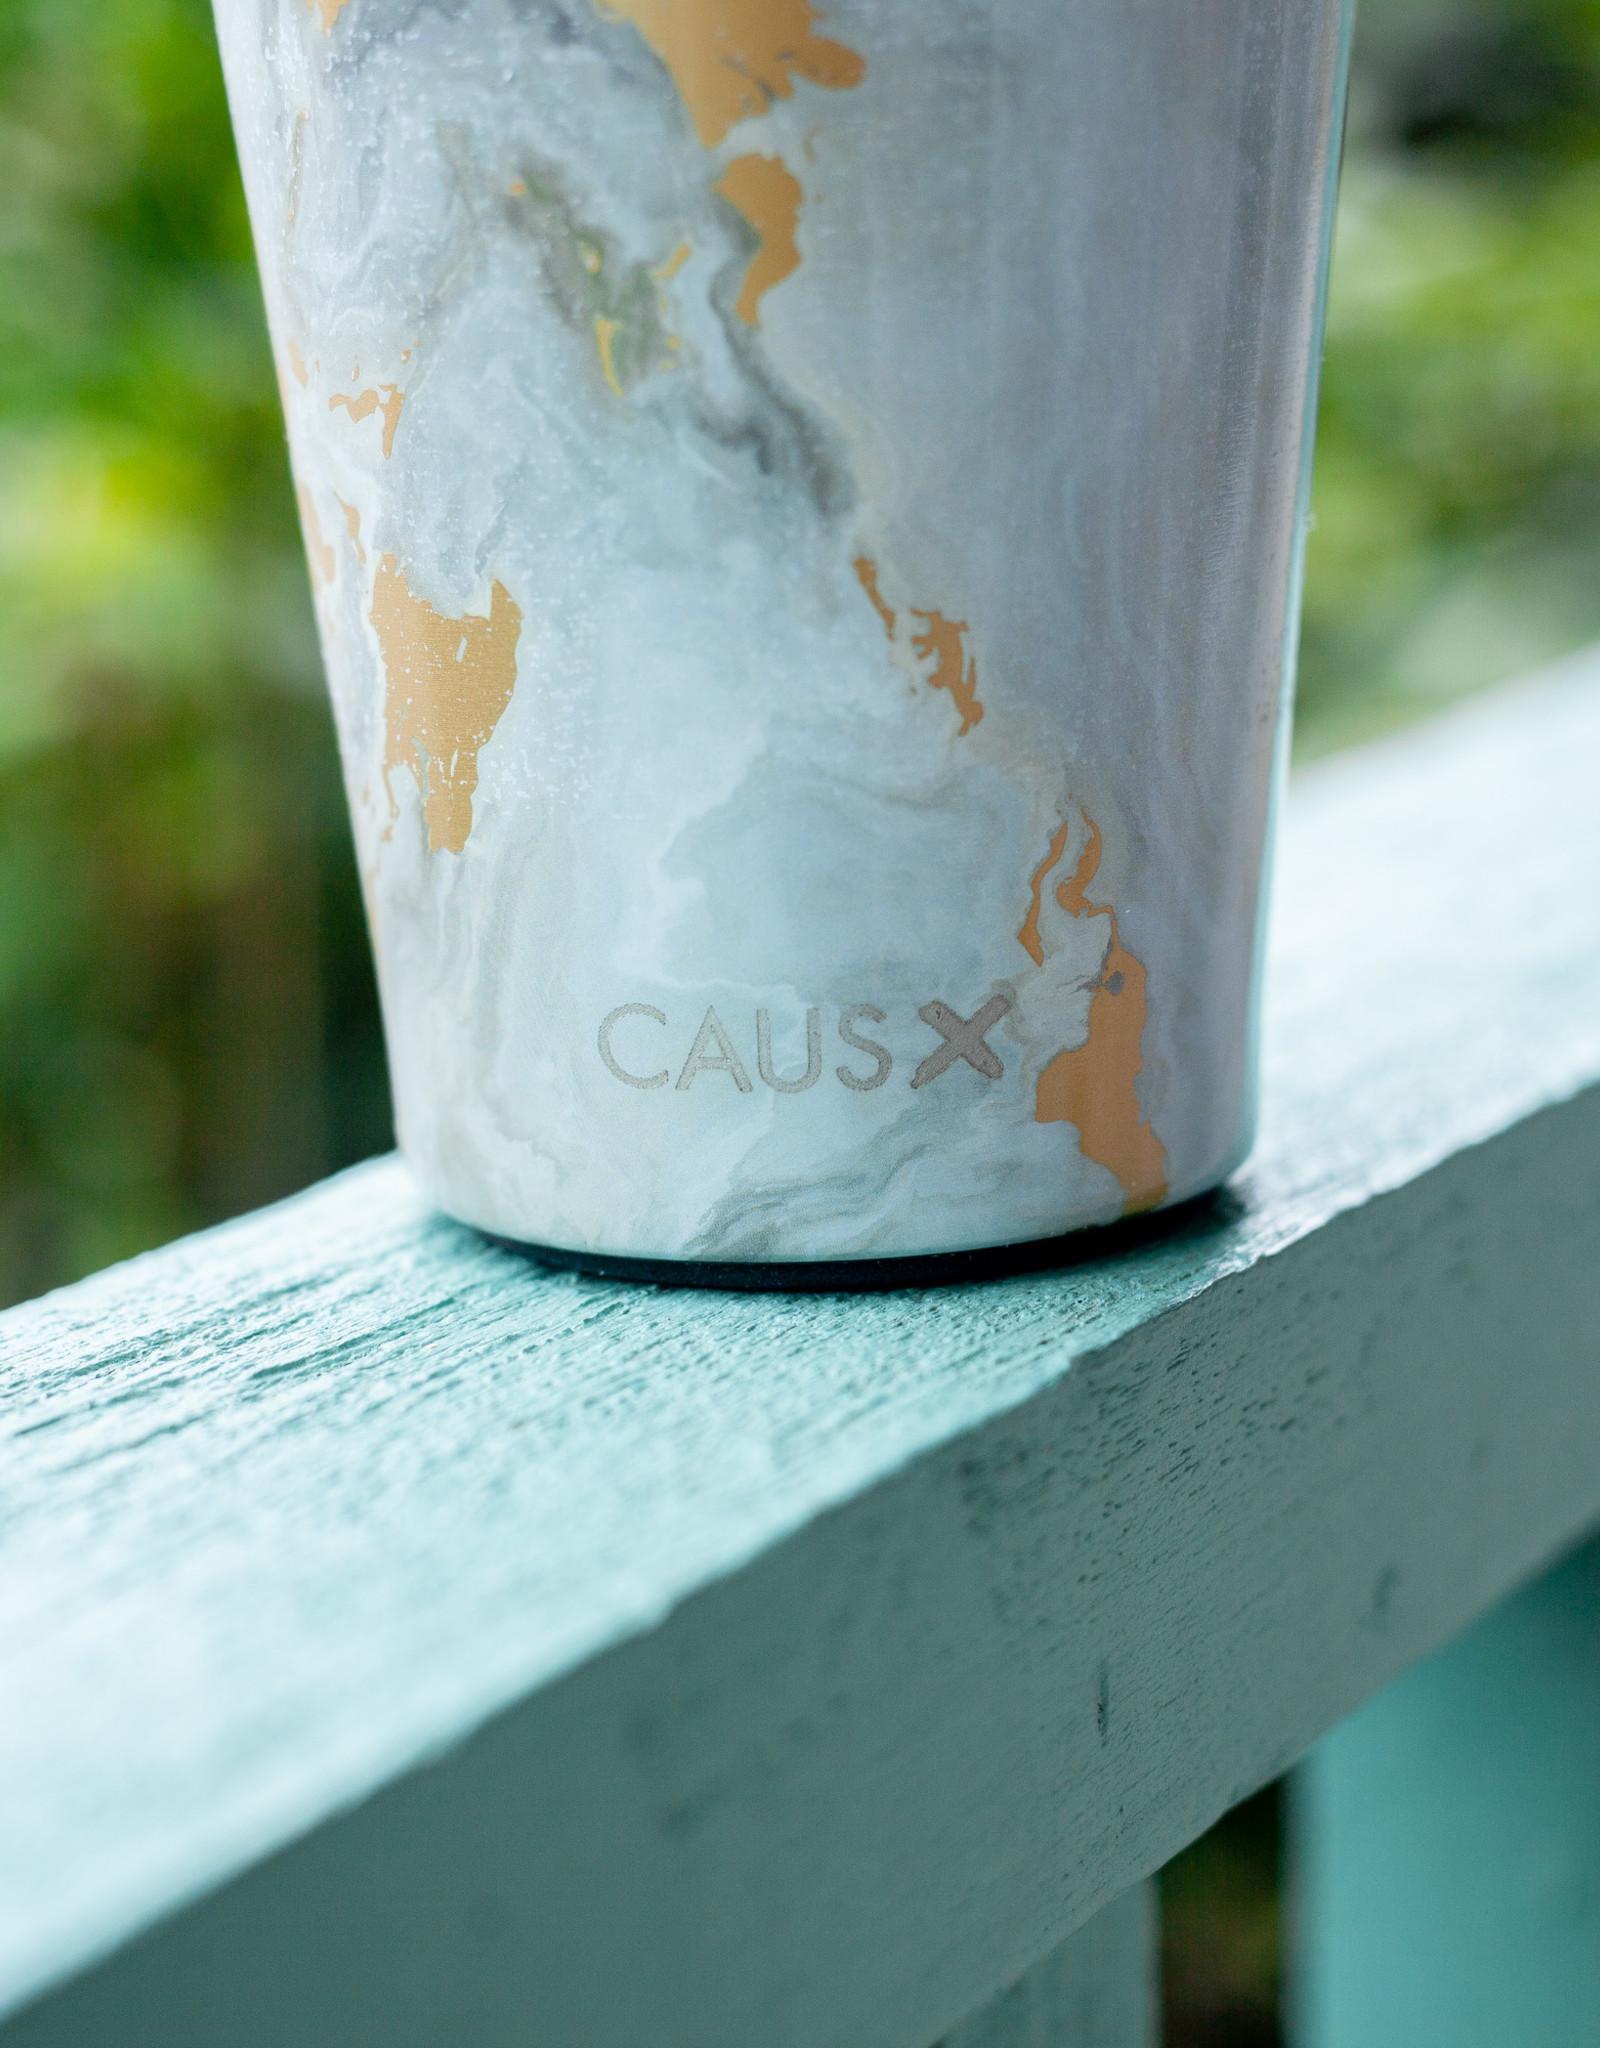 Caus Coffee Tumbler Grey Marble